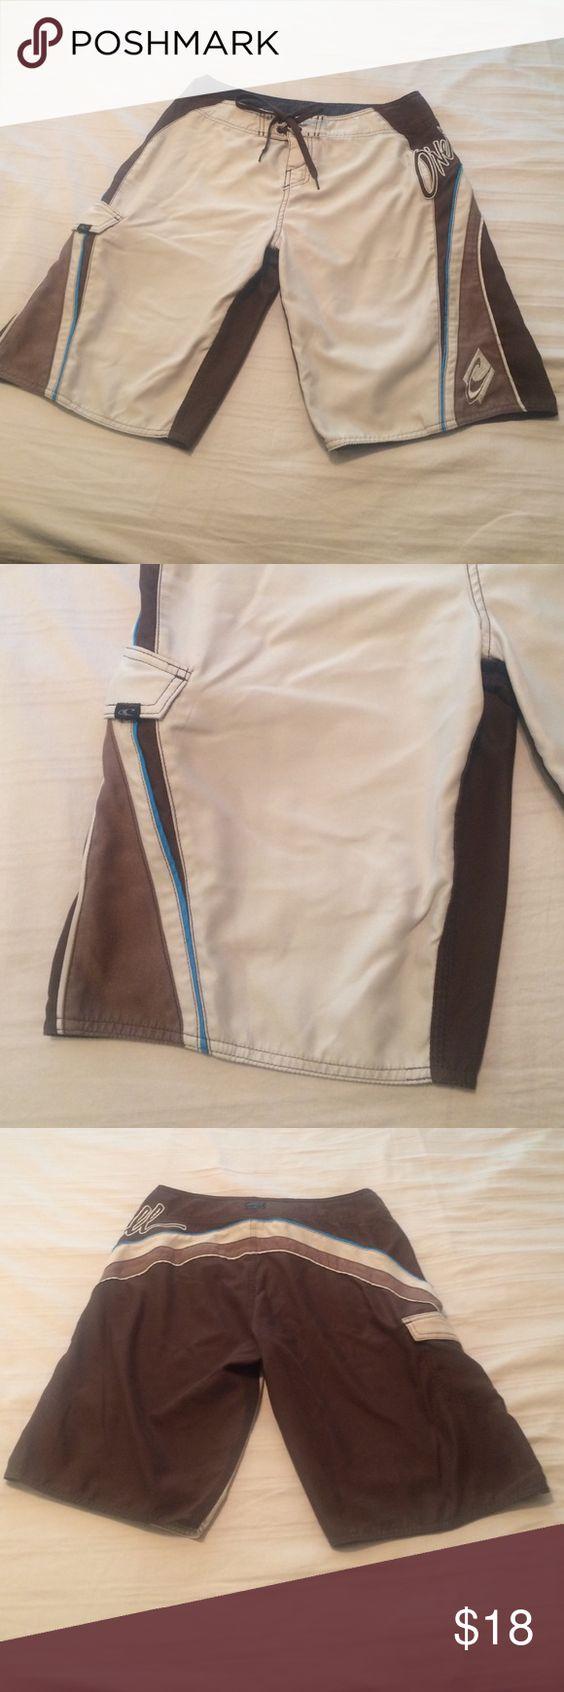 Men's Oneil swim trunks Have been worn but has plenty of wear left. Oneil  Swim Swim Trunks